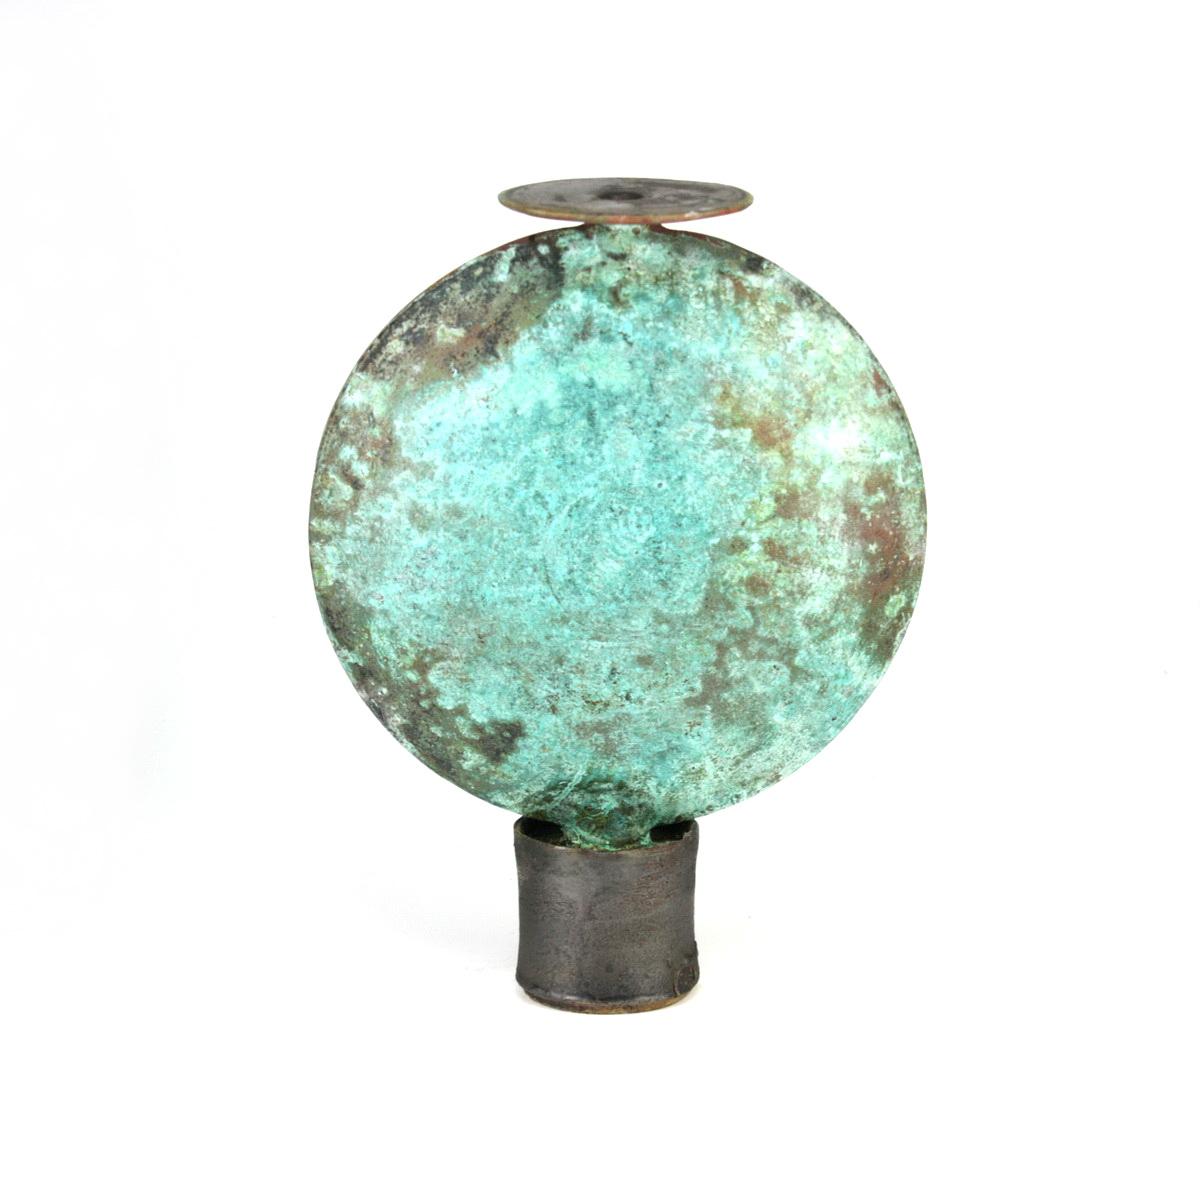 john-bedding-ceramic-pot-c124